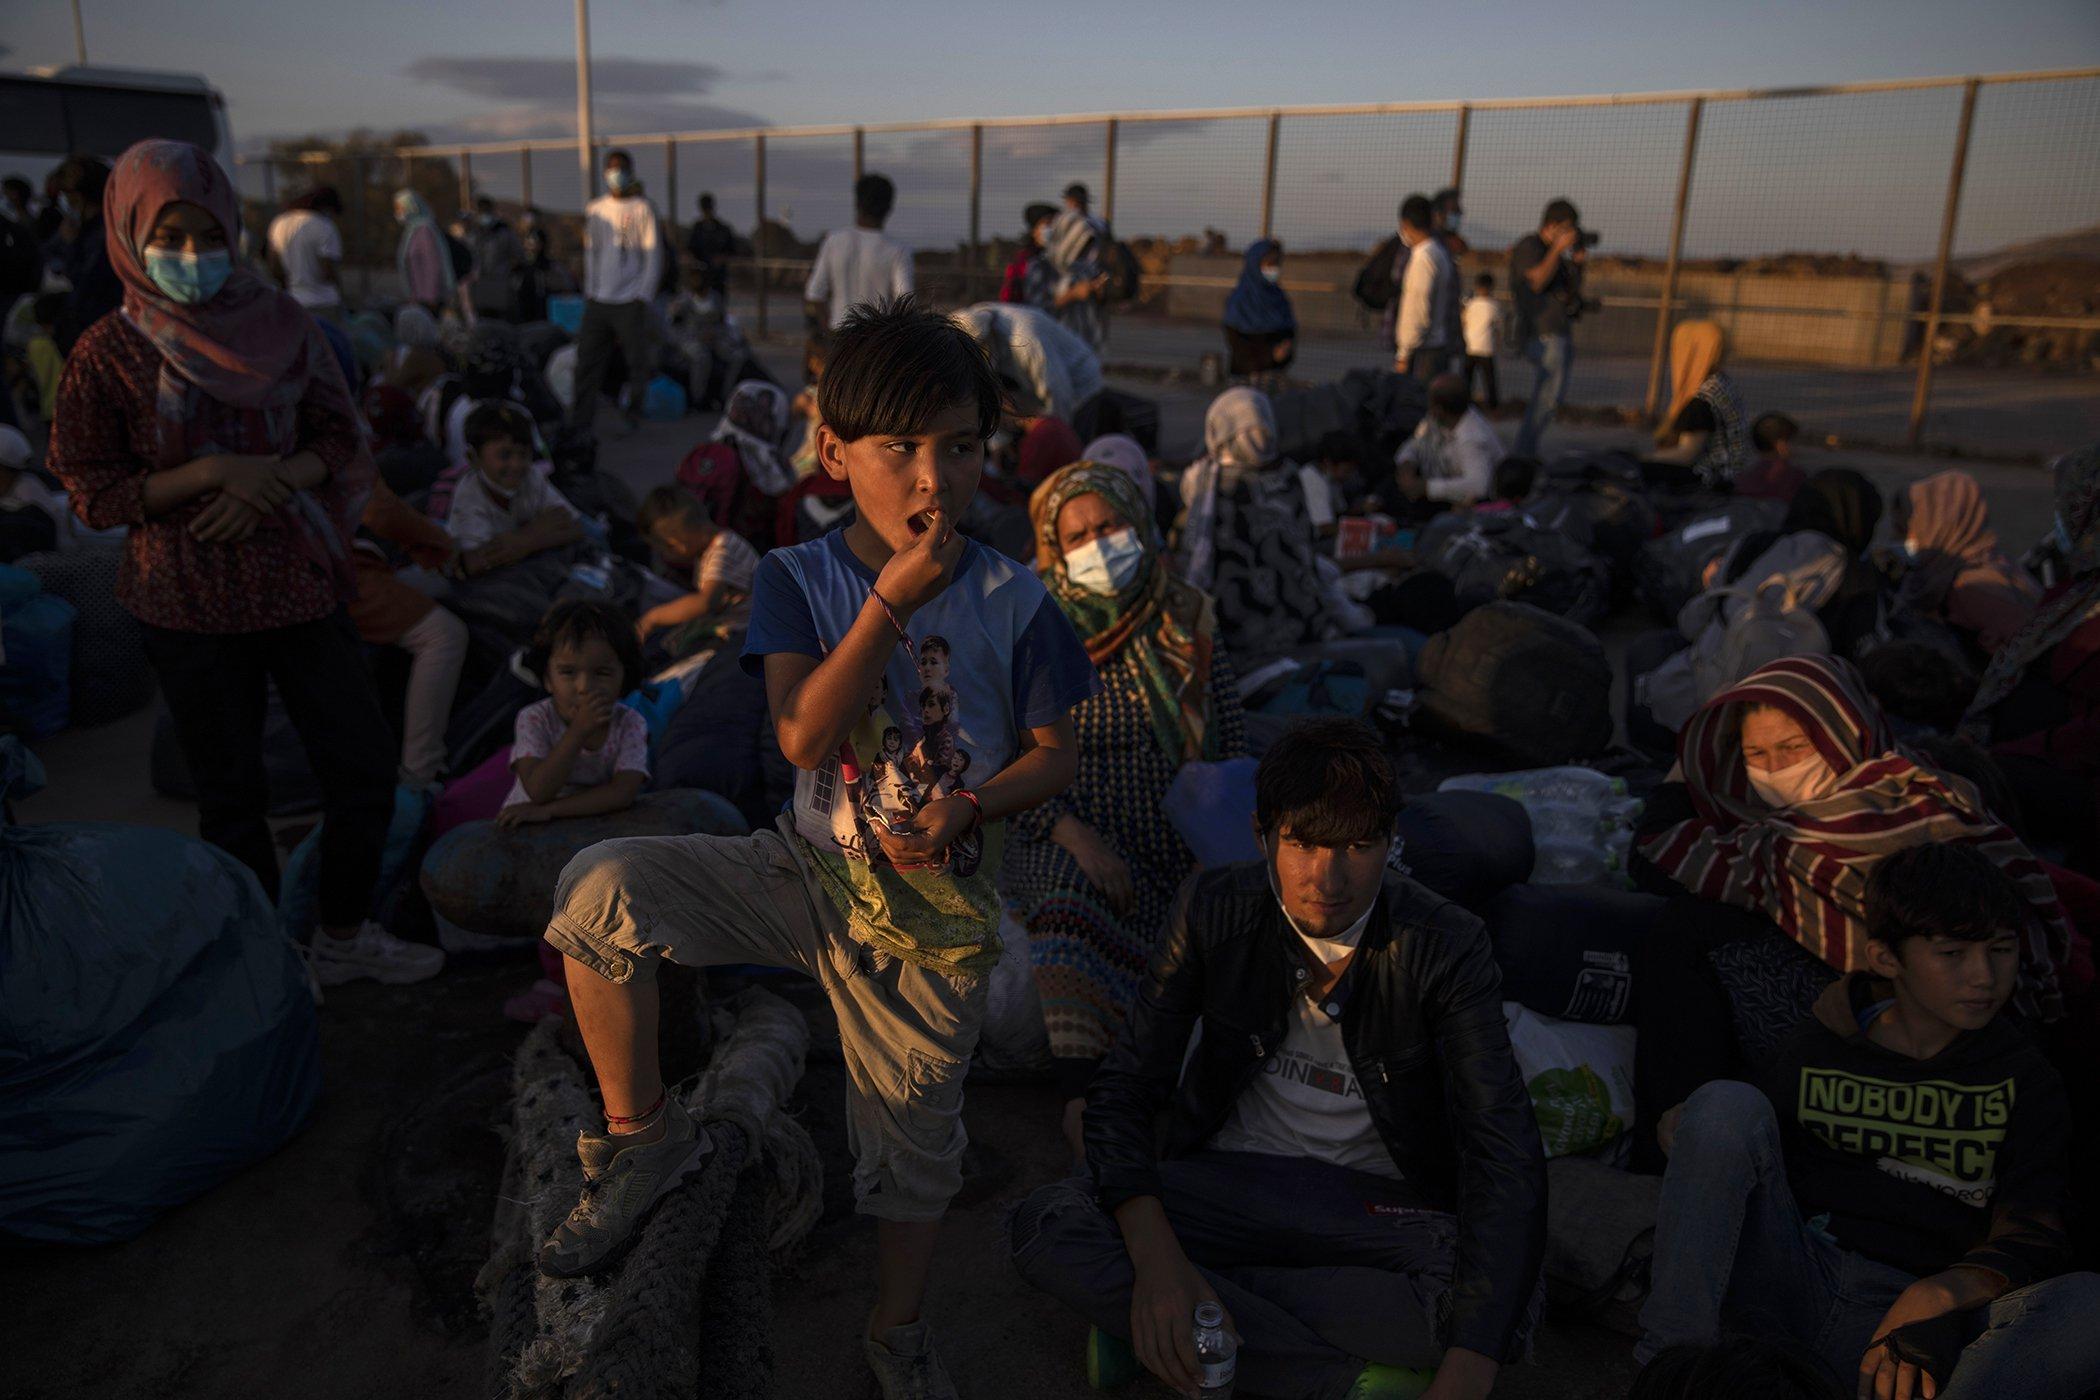 Moria-Refugee-Camp-Greece-Aftermath-Fires-002.jpg